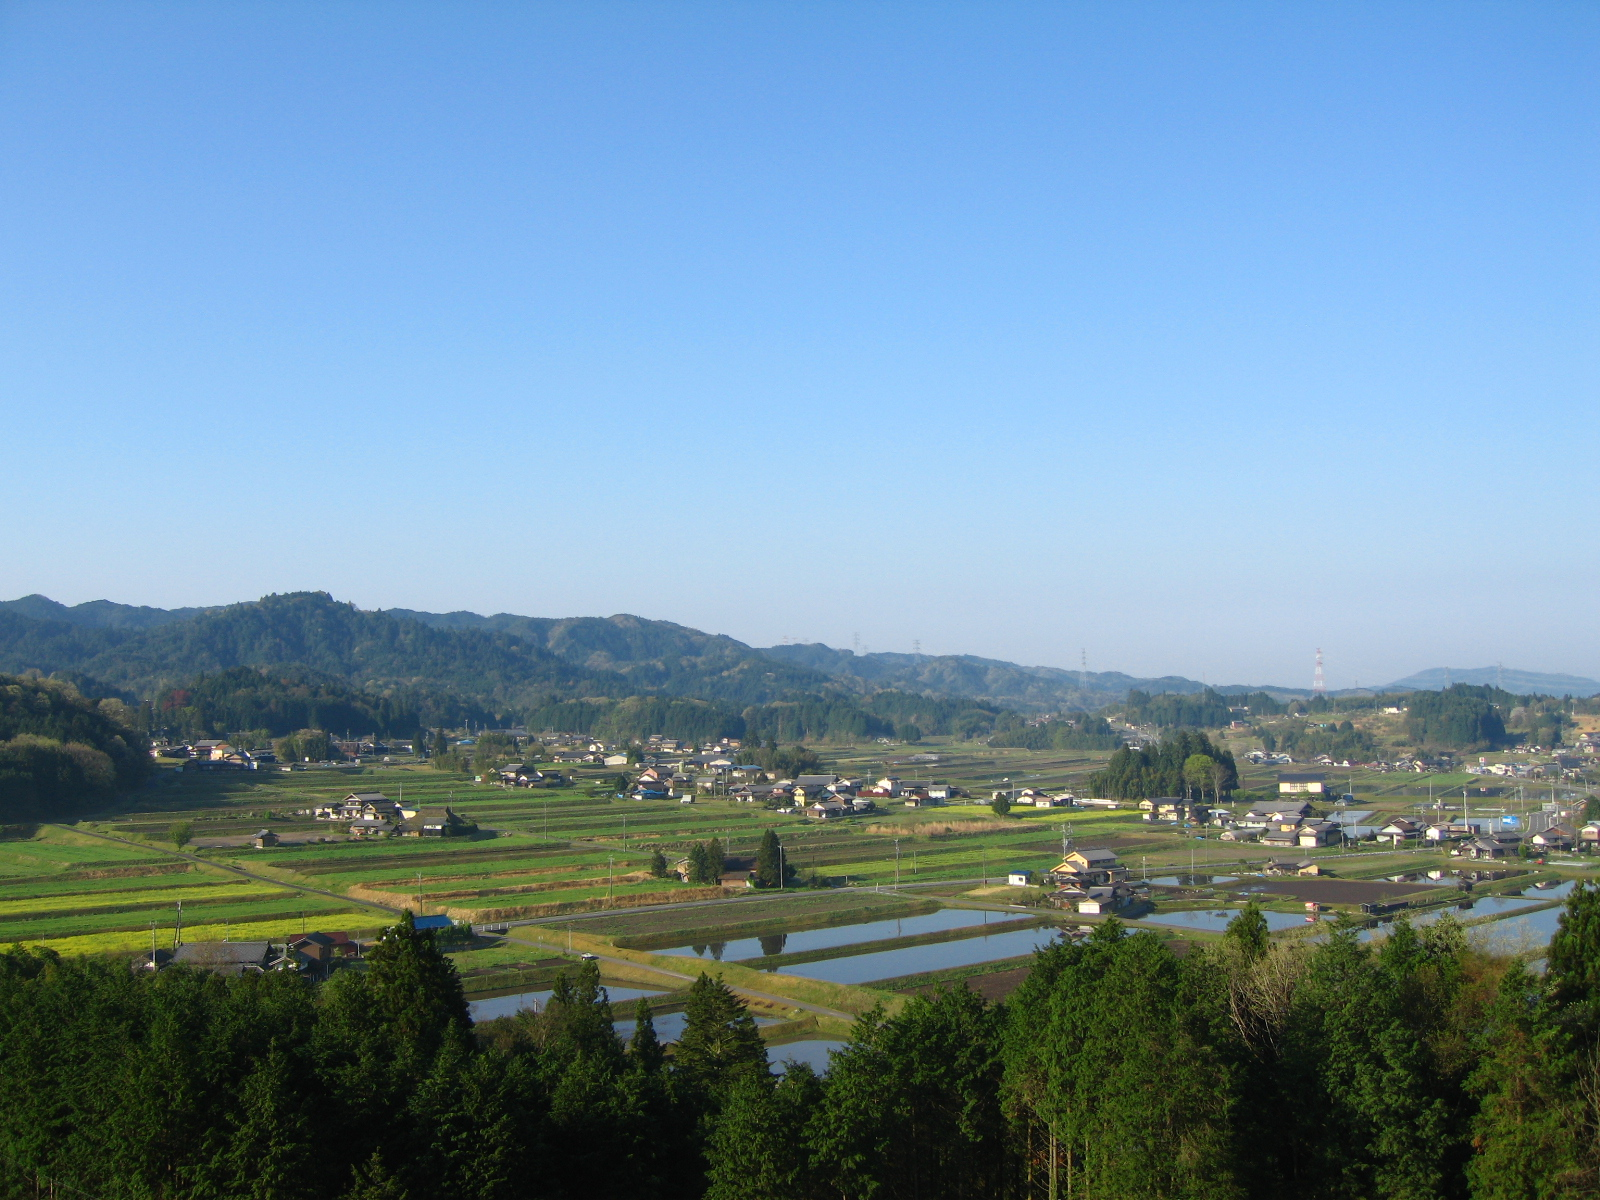 農村景観日本一の地